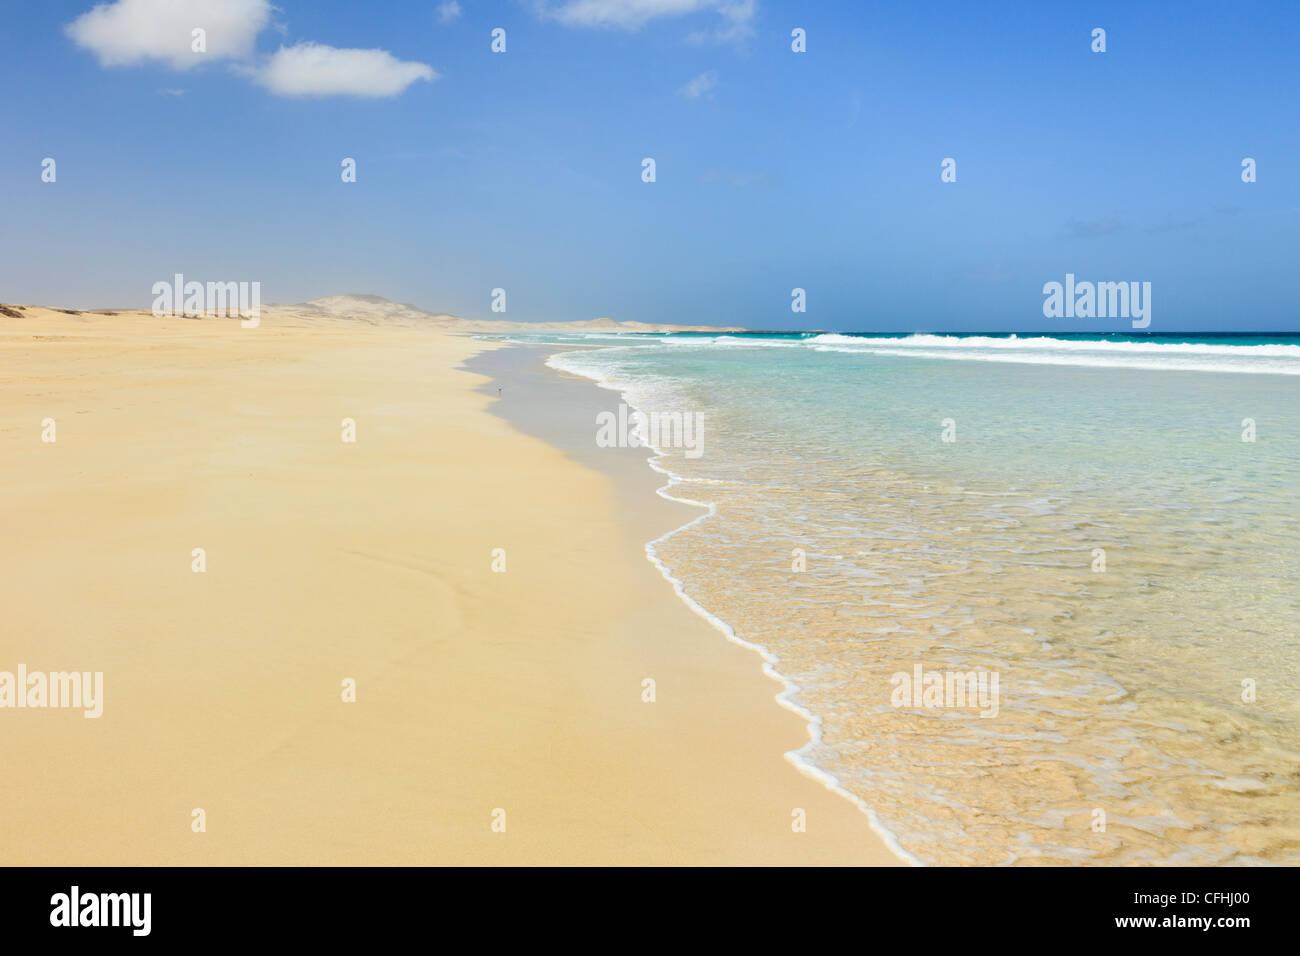 Praia de Chaves, Rabil, Boa Vista, Cape Verde Islands. View along shoreline of empty long white sand beach with - Stock Image